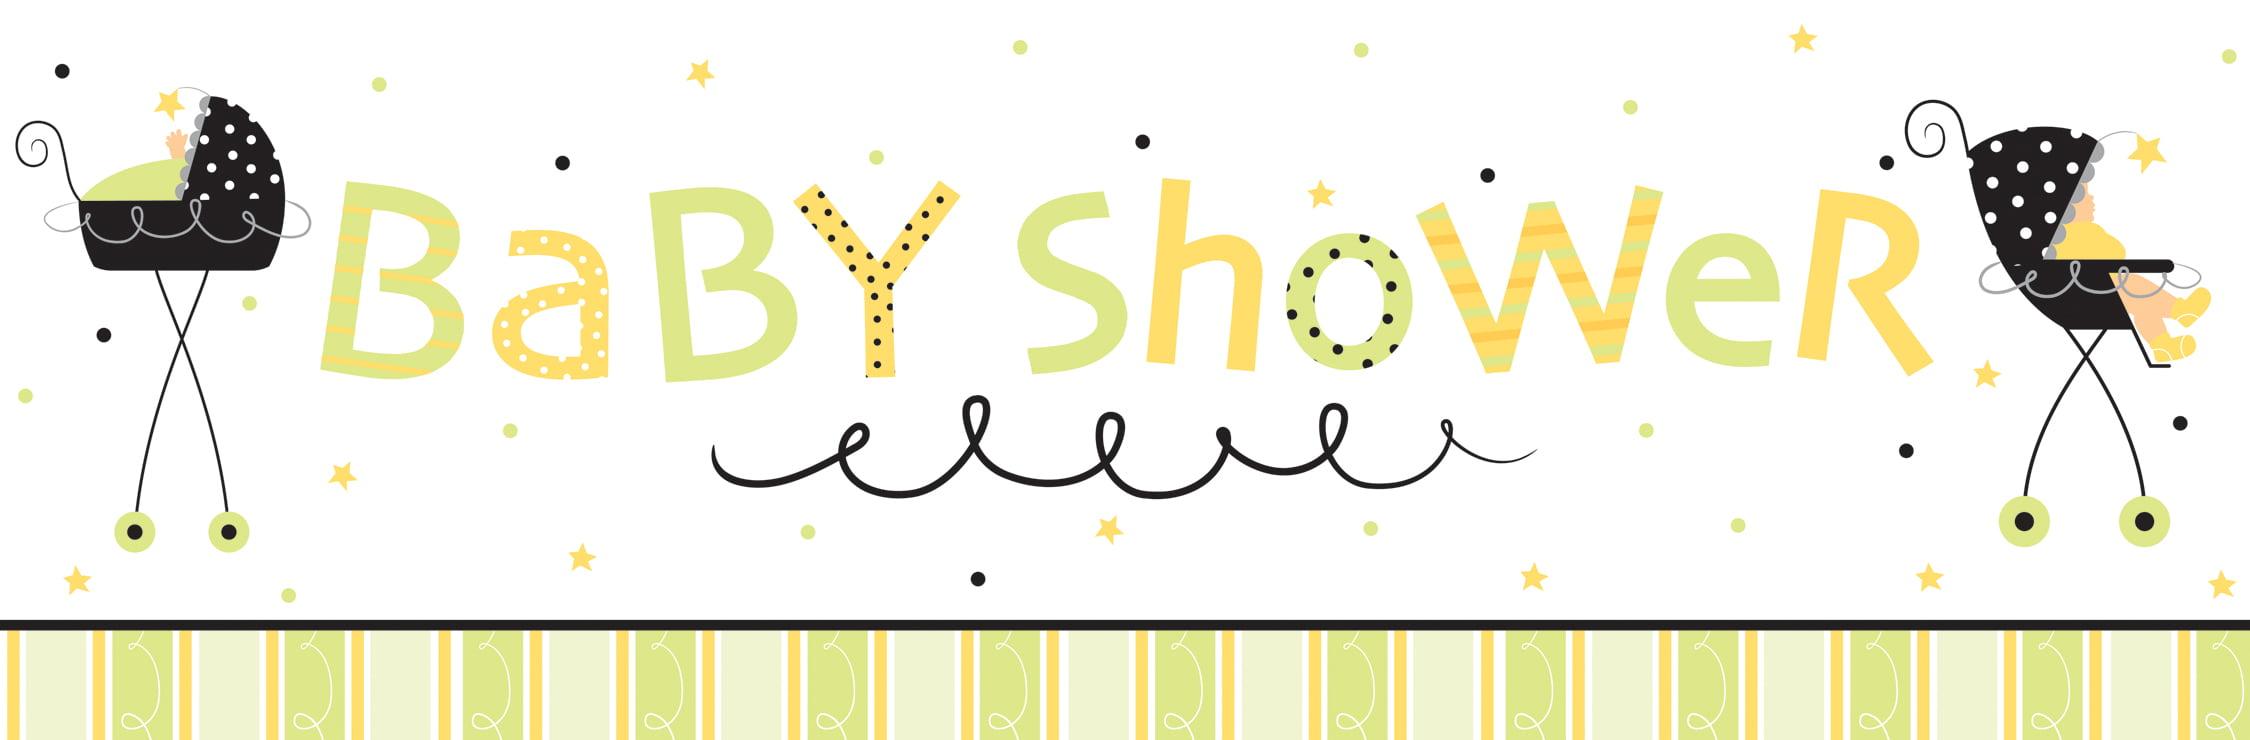 How Make Baby Shower Invitations Online